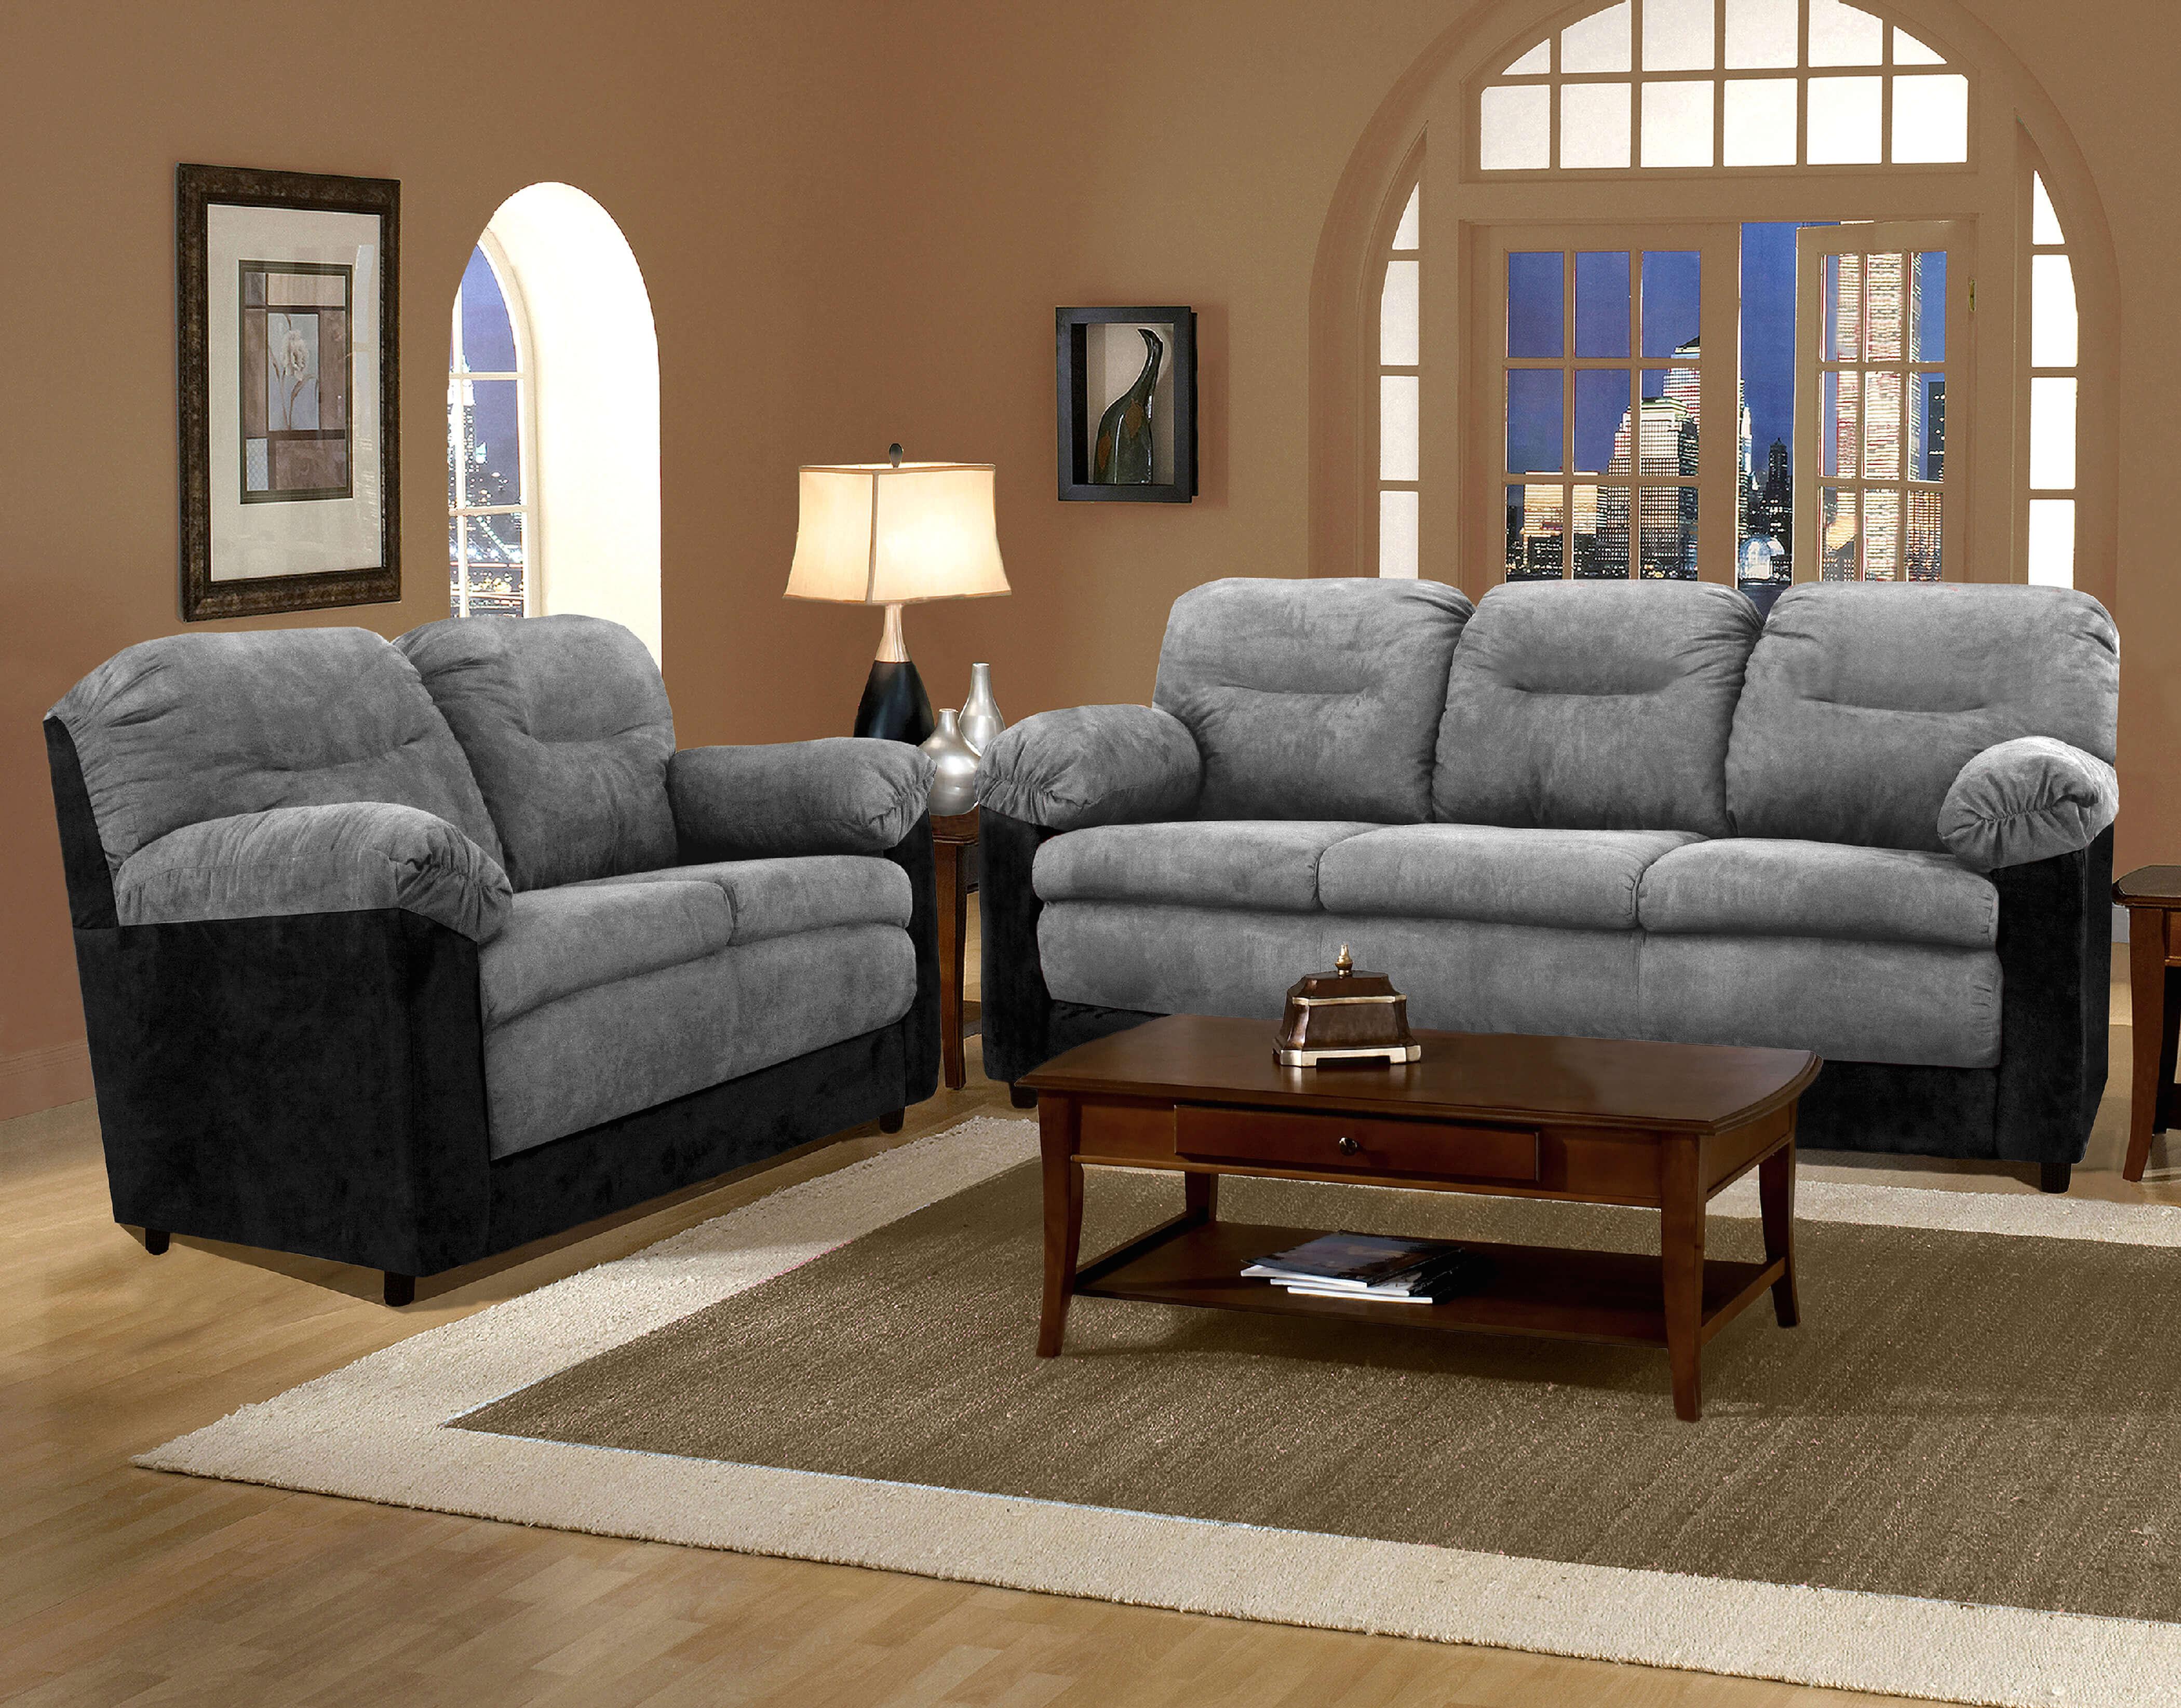 Black Sofa And Loveseat Set Coaster Reventlow 2pc Black